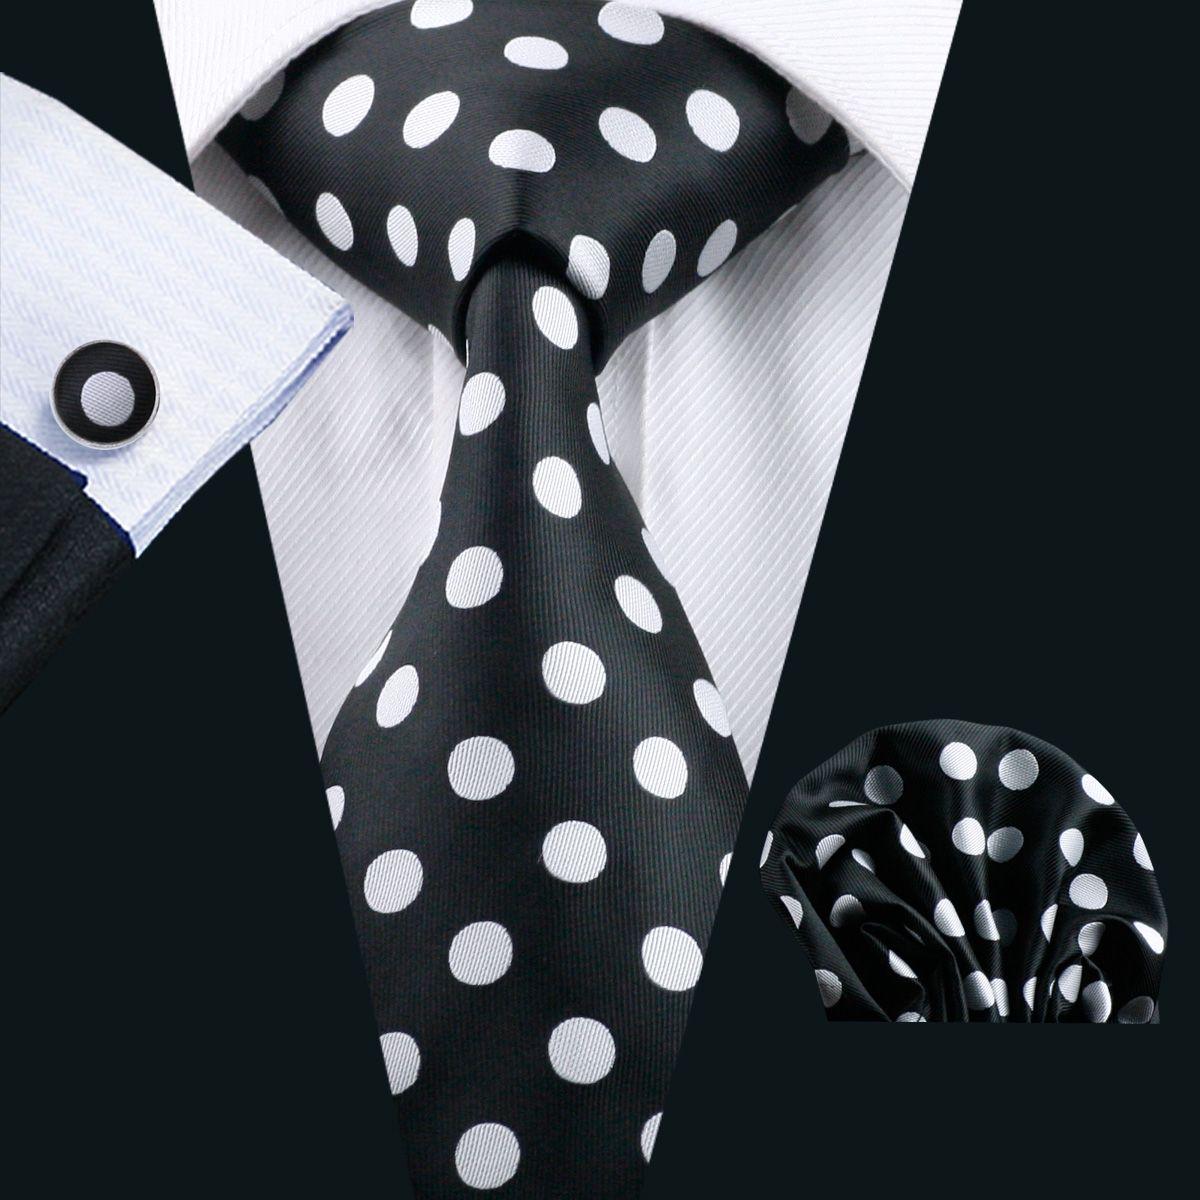 Snelle verzending Black Tie Witte Dot Mens Tie Pocket Square Manchetknopen Set 8.5cm Meeting Business Casual Party Stropdas Jacquard Woven N-1190